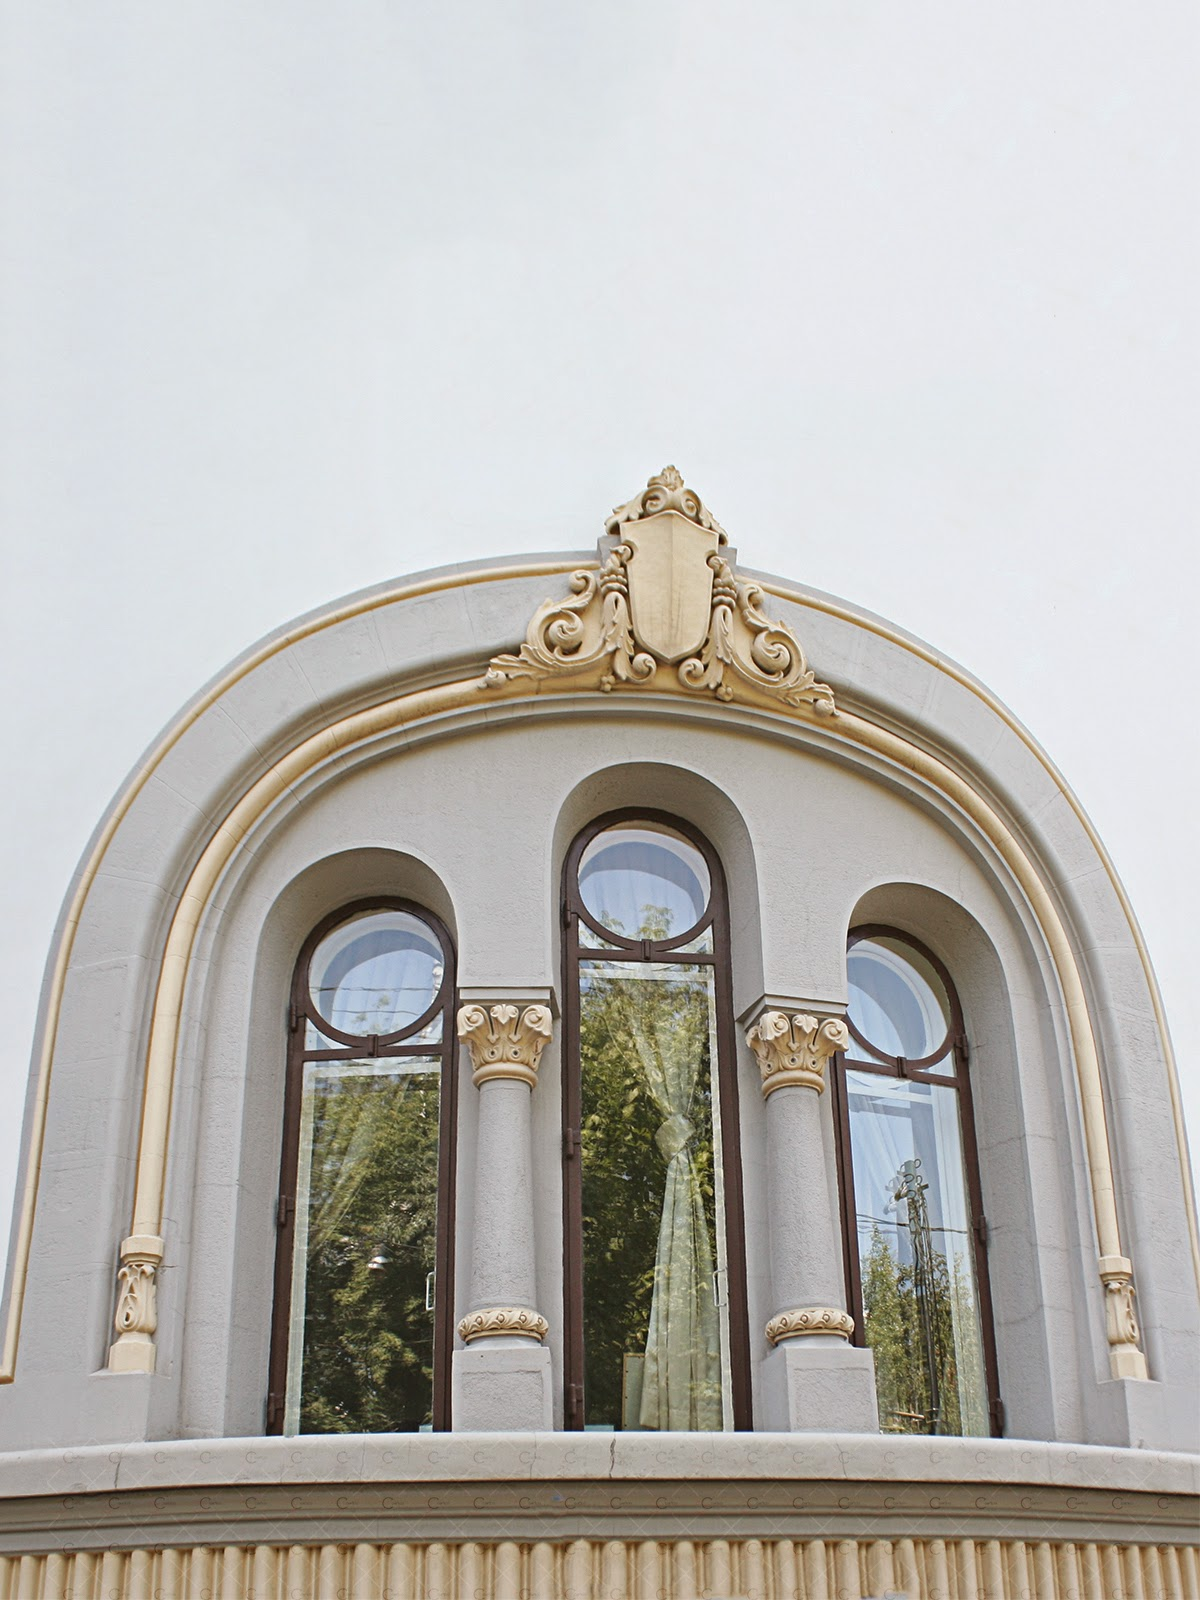 fereastra casa neoromaneasca, ancadramente, arcada, blazon, cheie de bolta